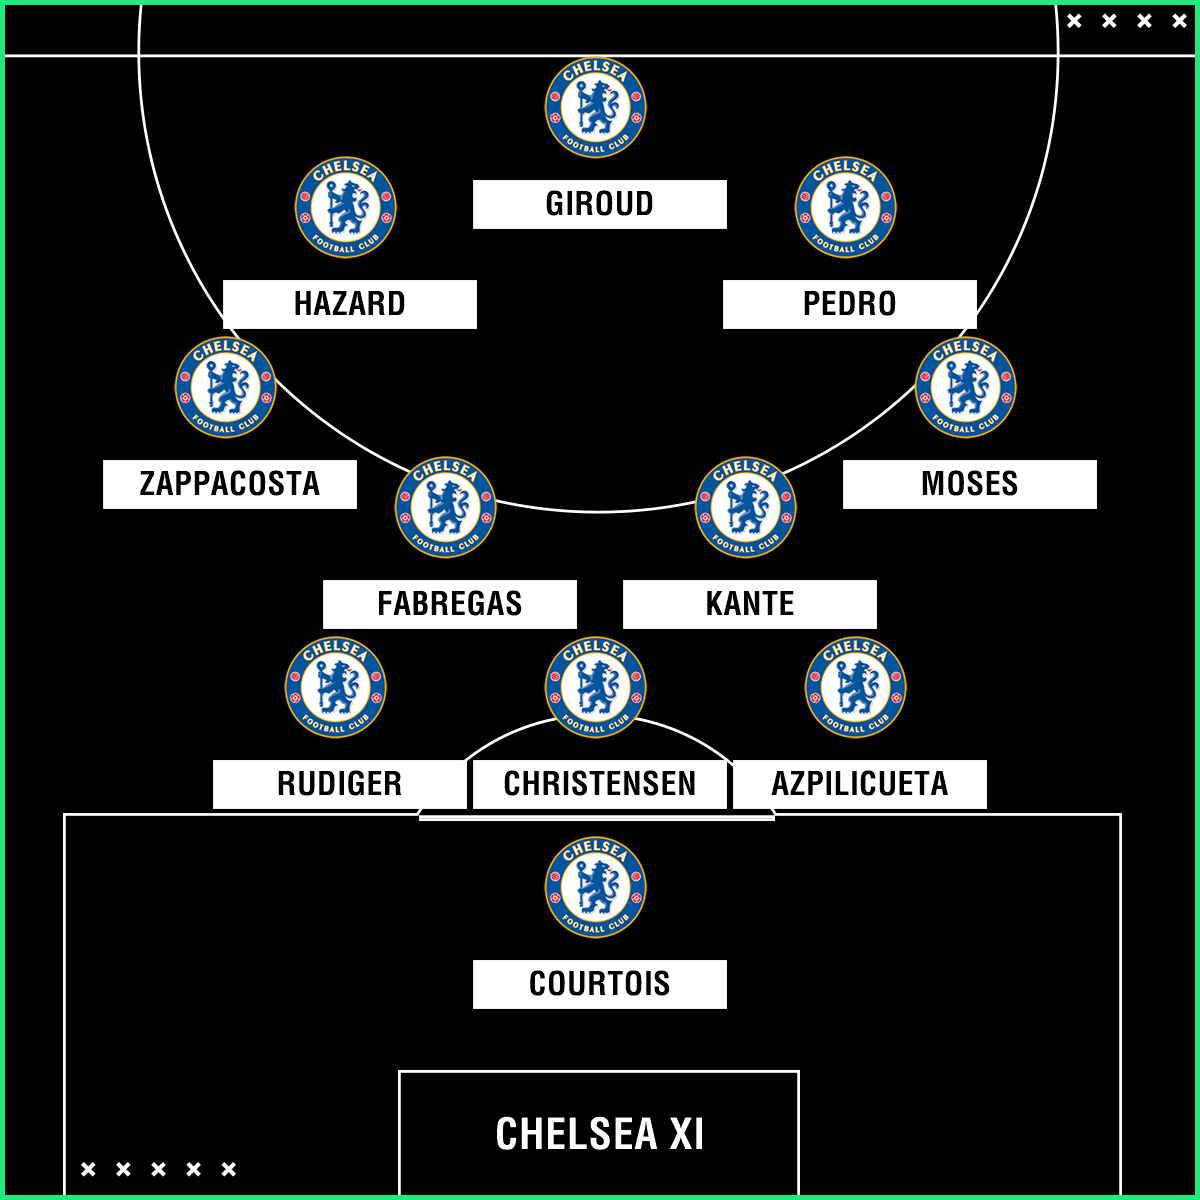 Chelsea XI to face WBA